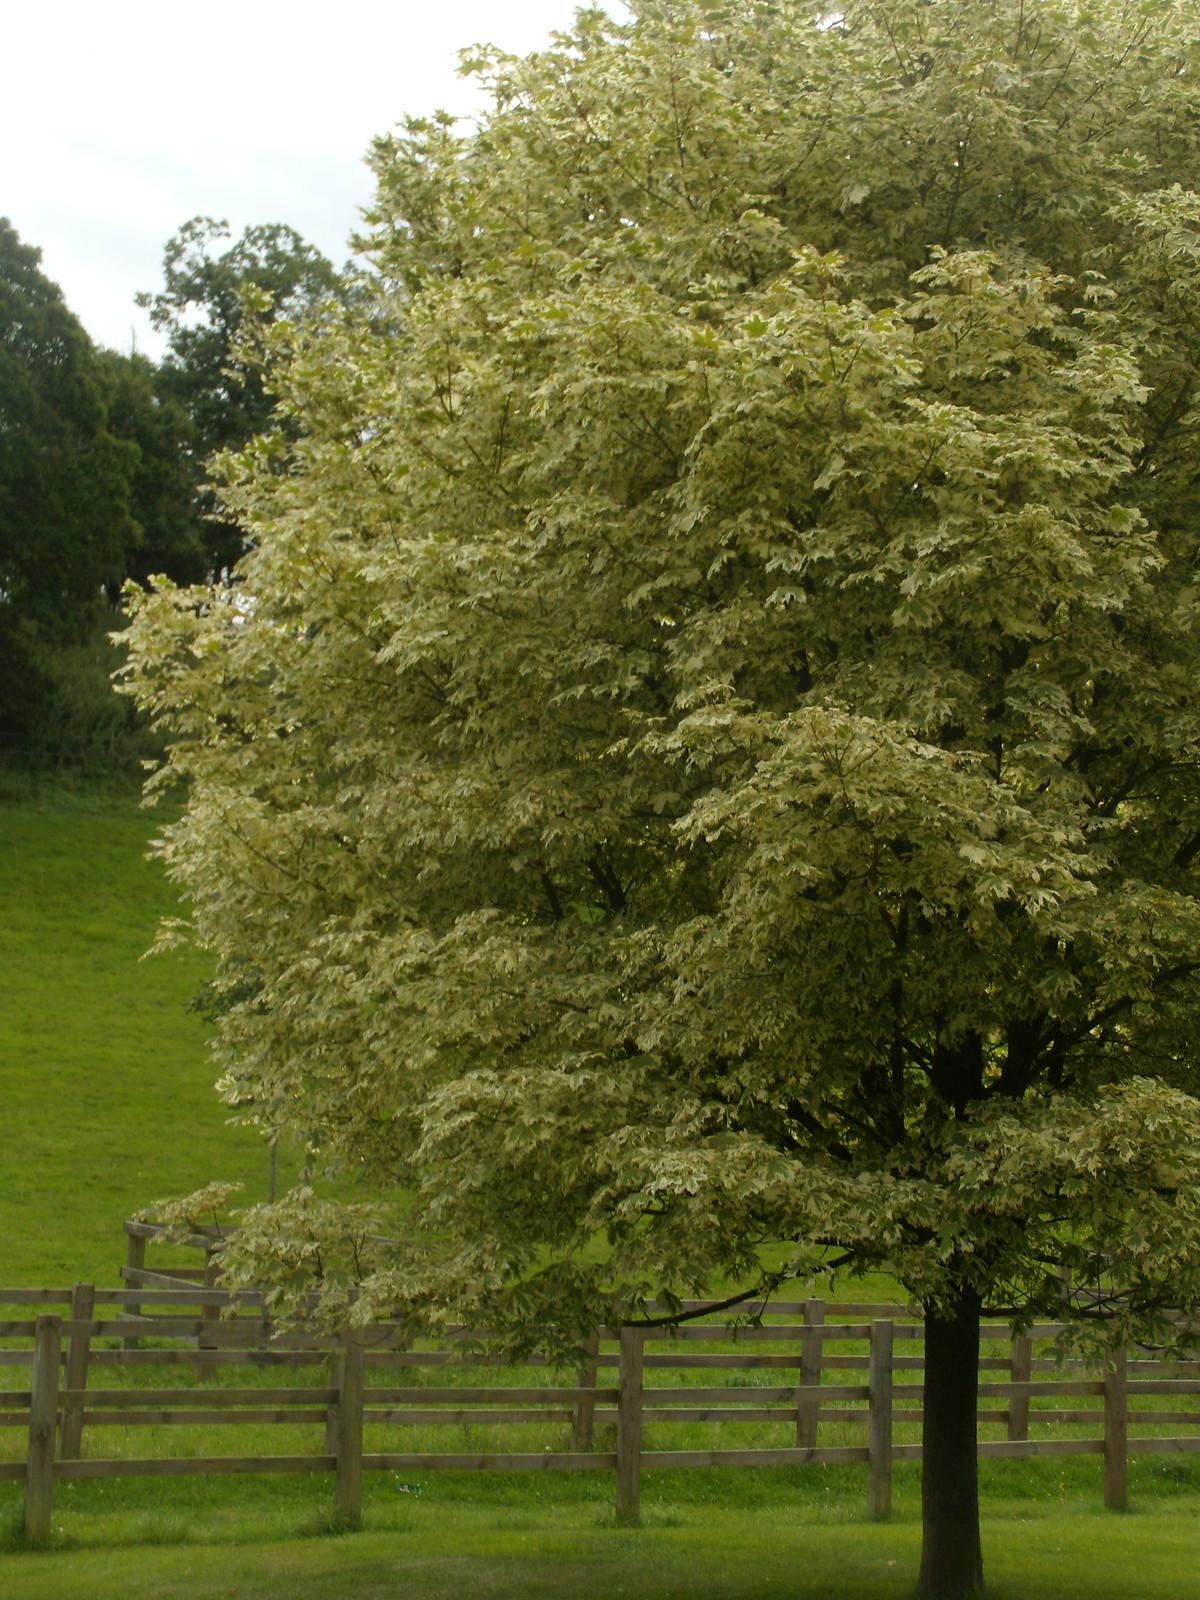 variegated maple Compton. Wanborough to Godalming